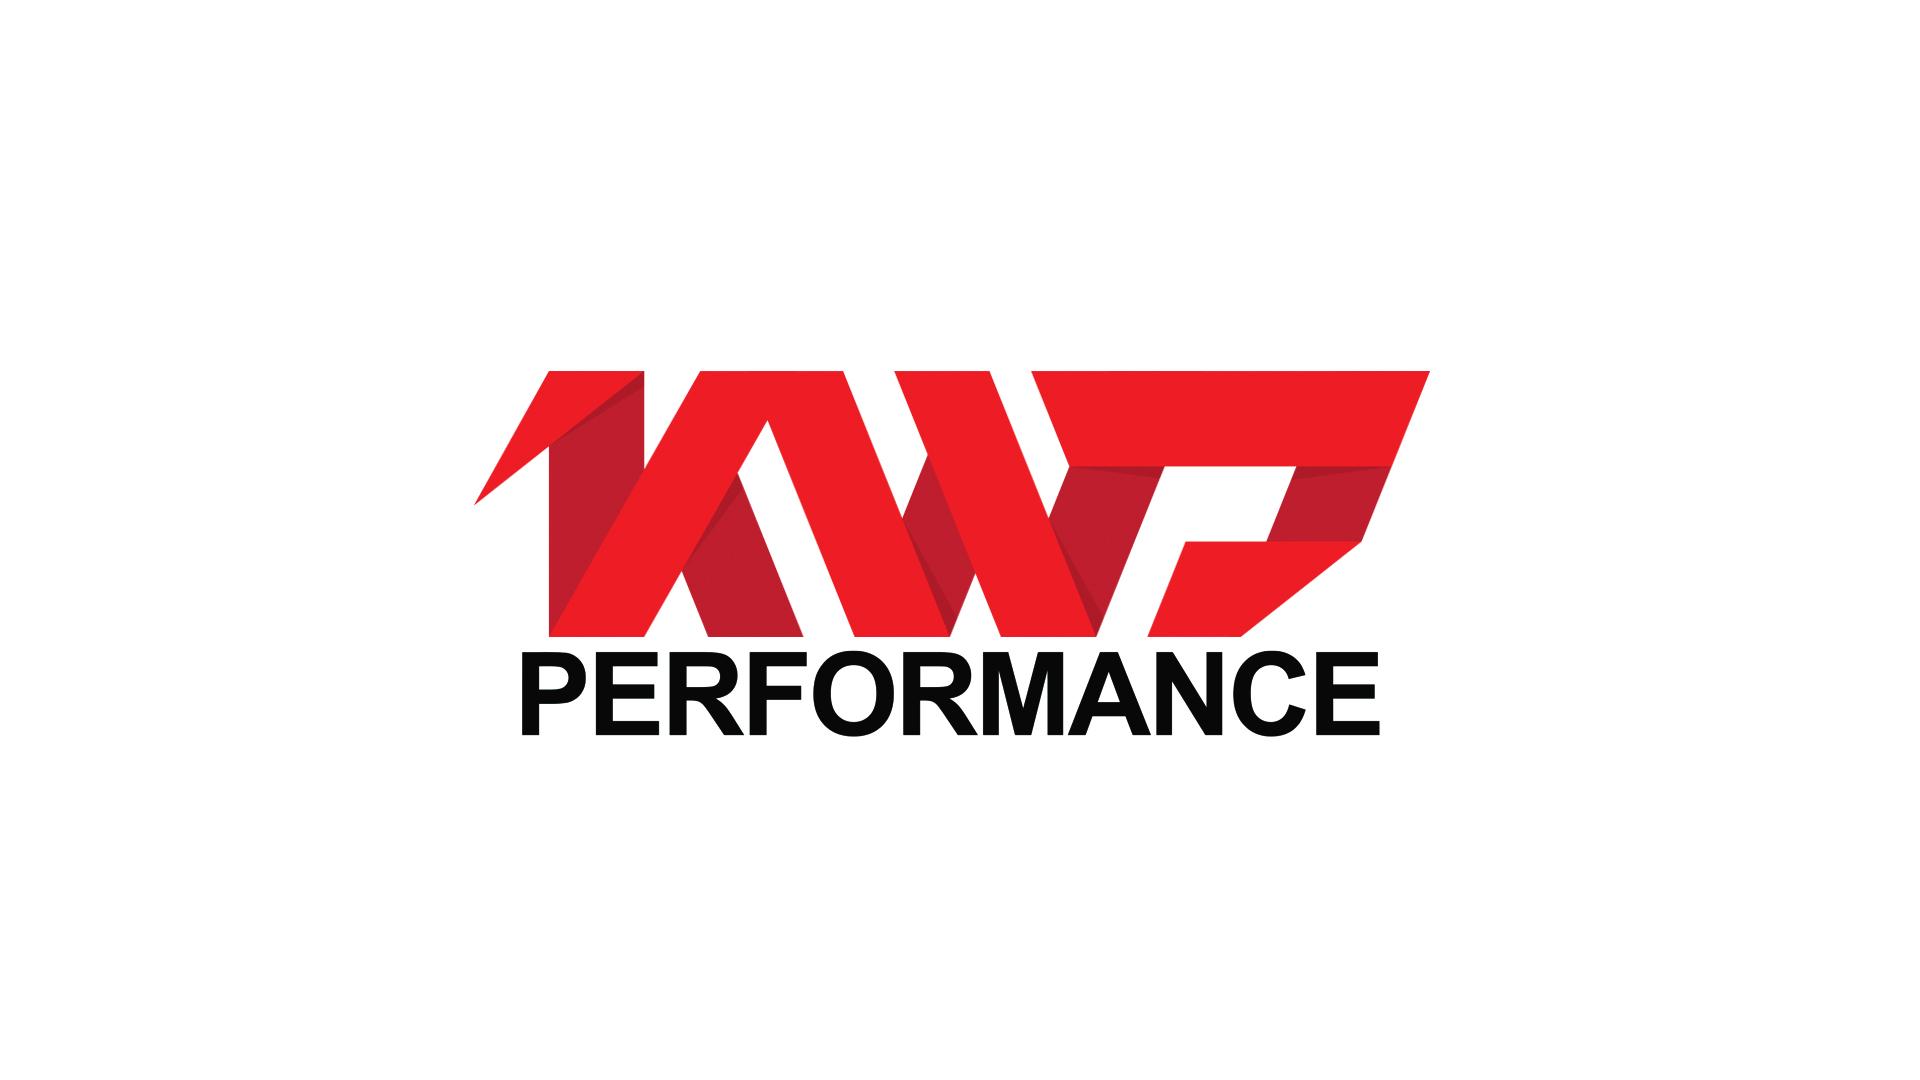 KWJ Performance